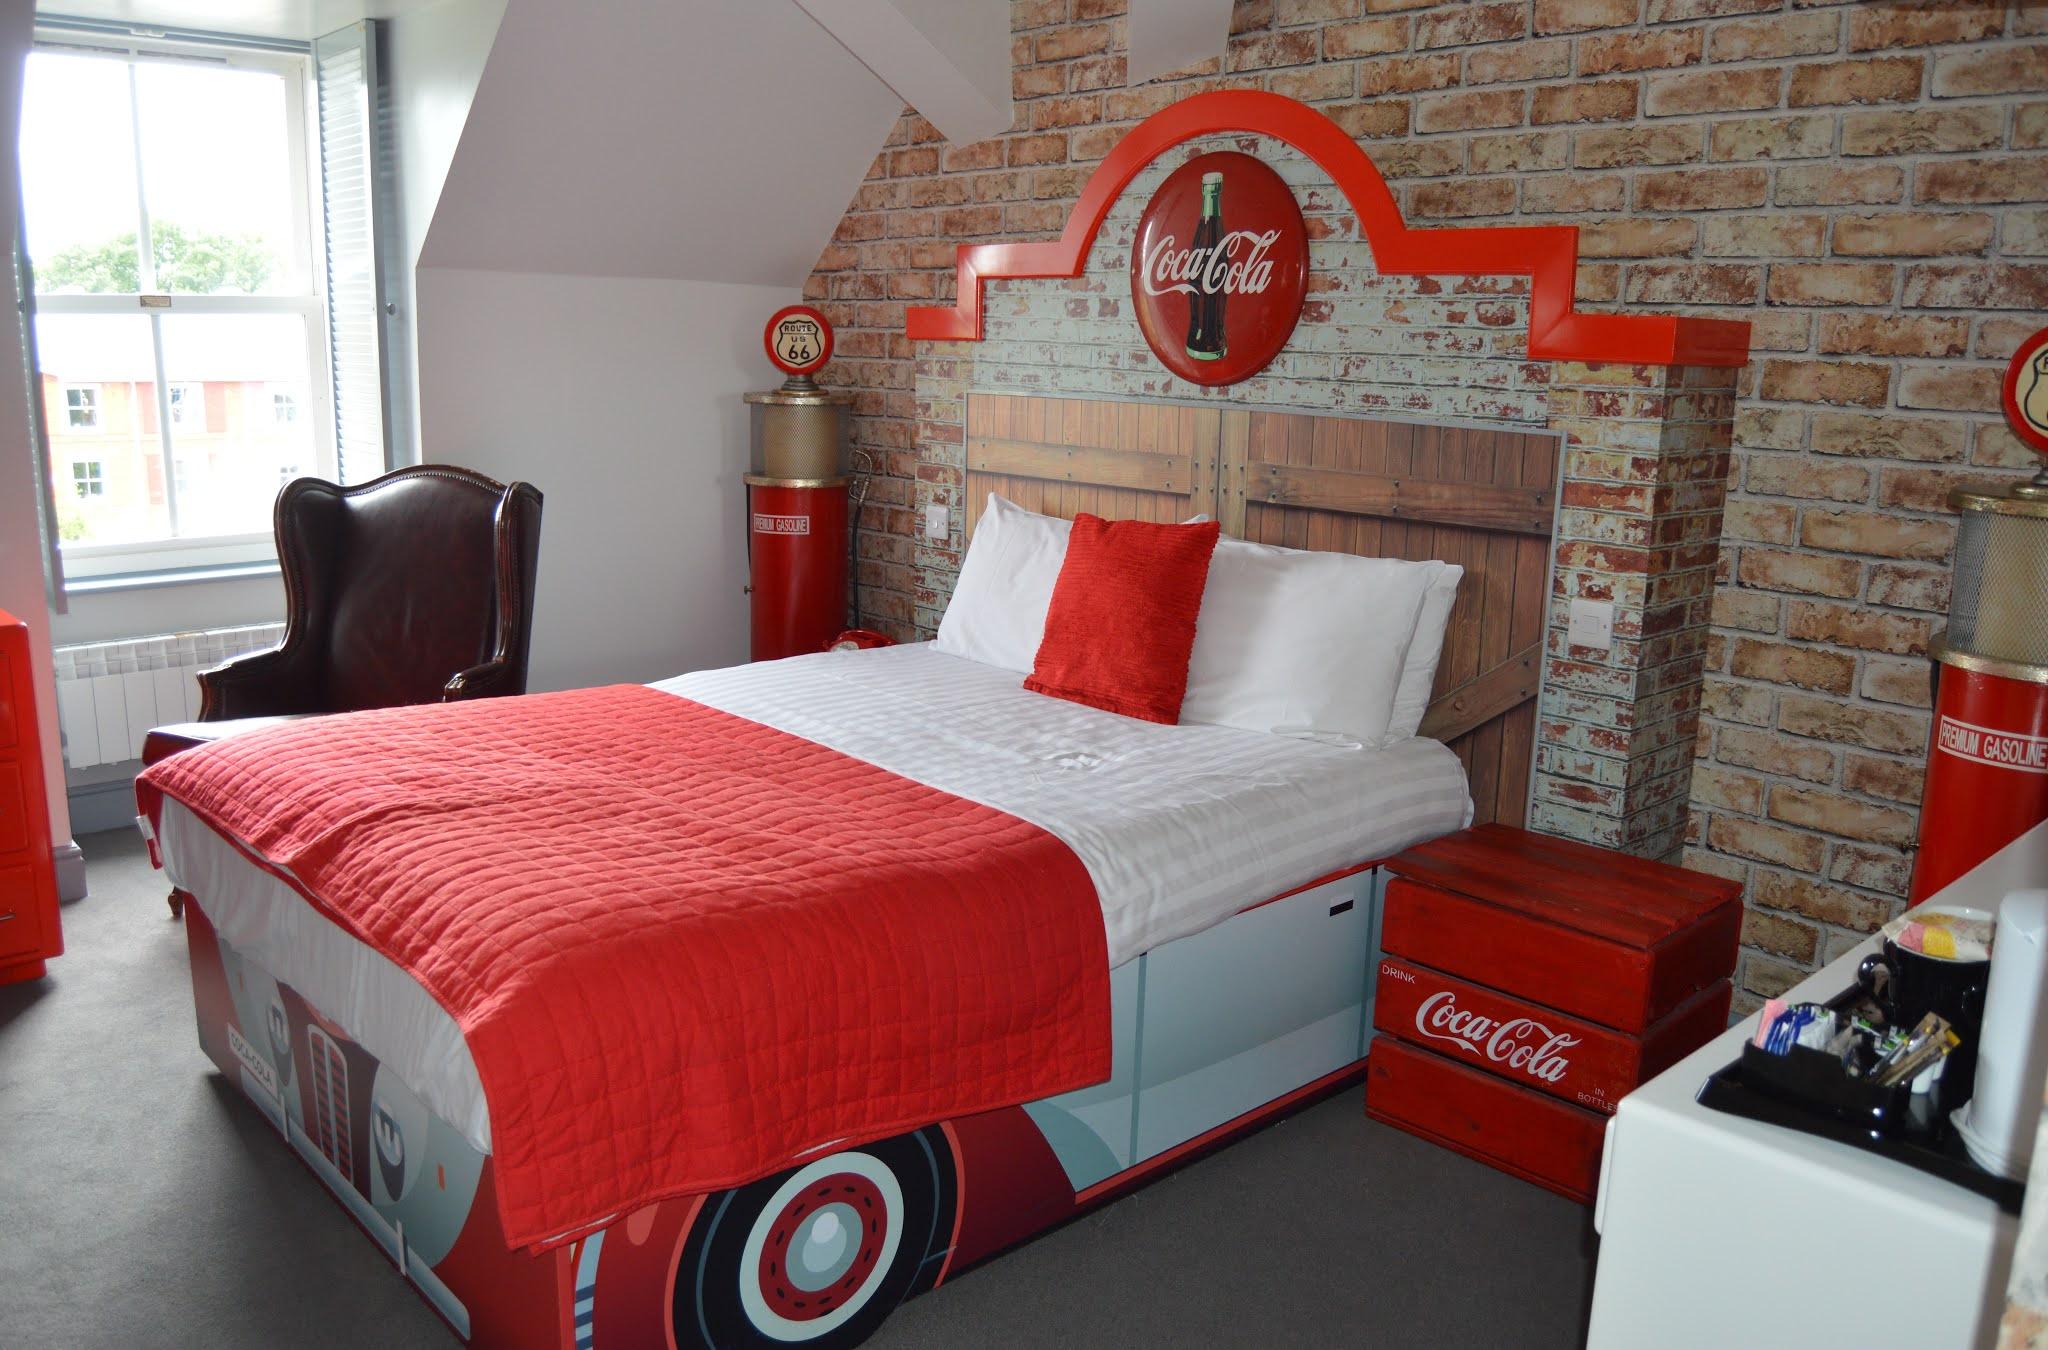 The Coca Cola Room